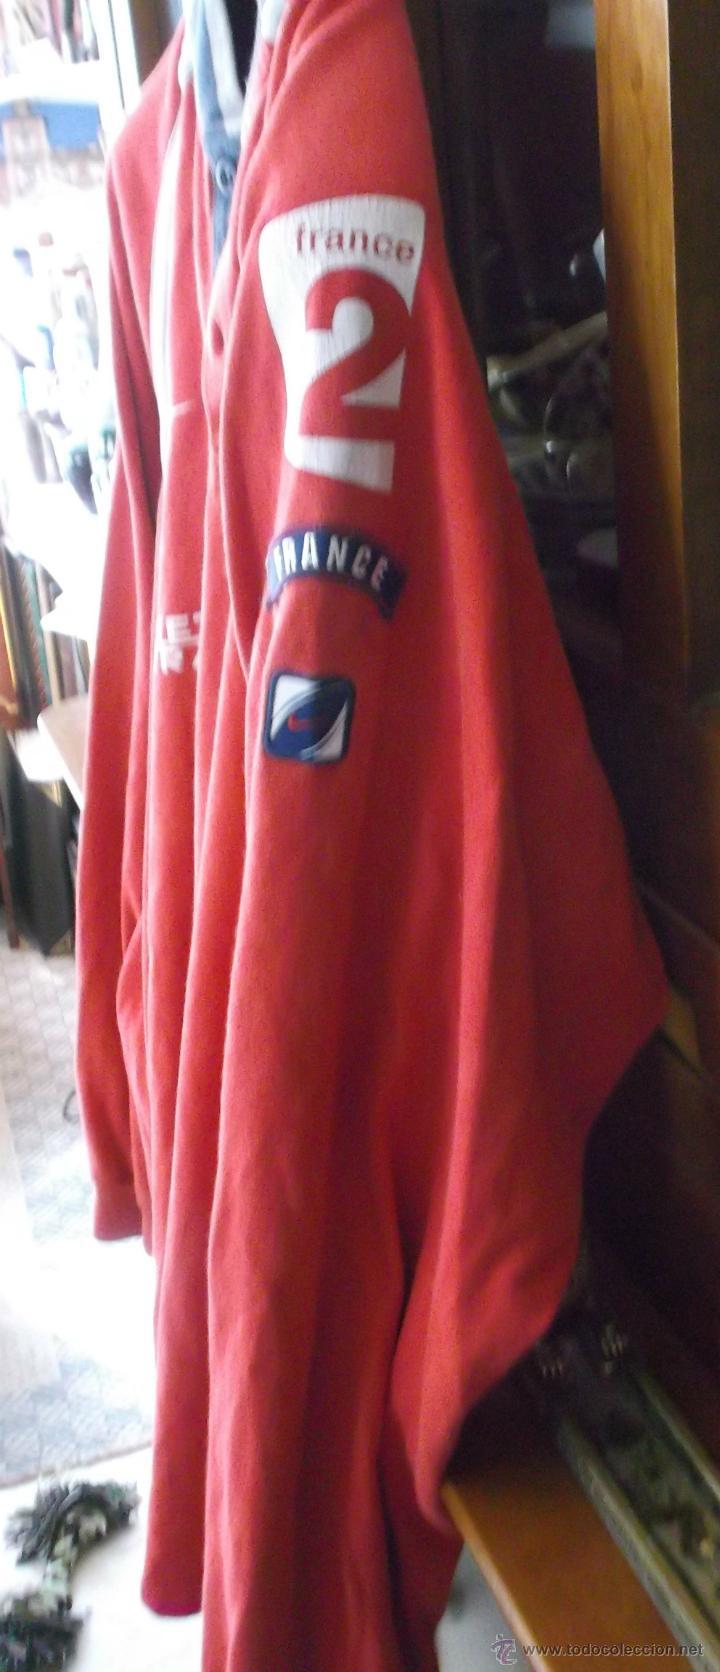 Coleccionismo deportivo: camiseta manga larga original de la seleccion francesa de rugby talla grande - Foto 3 - 45672380